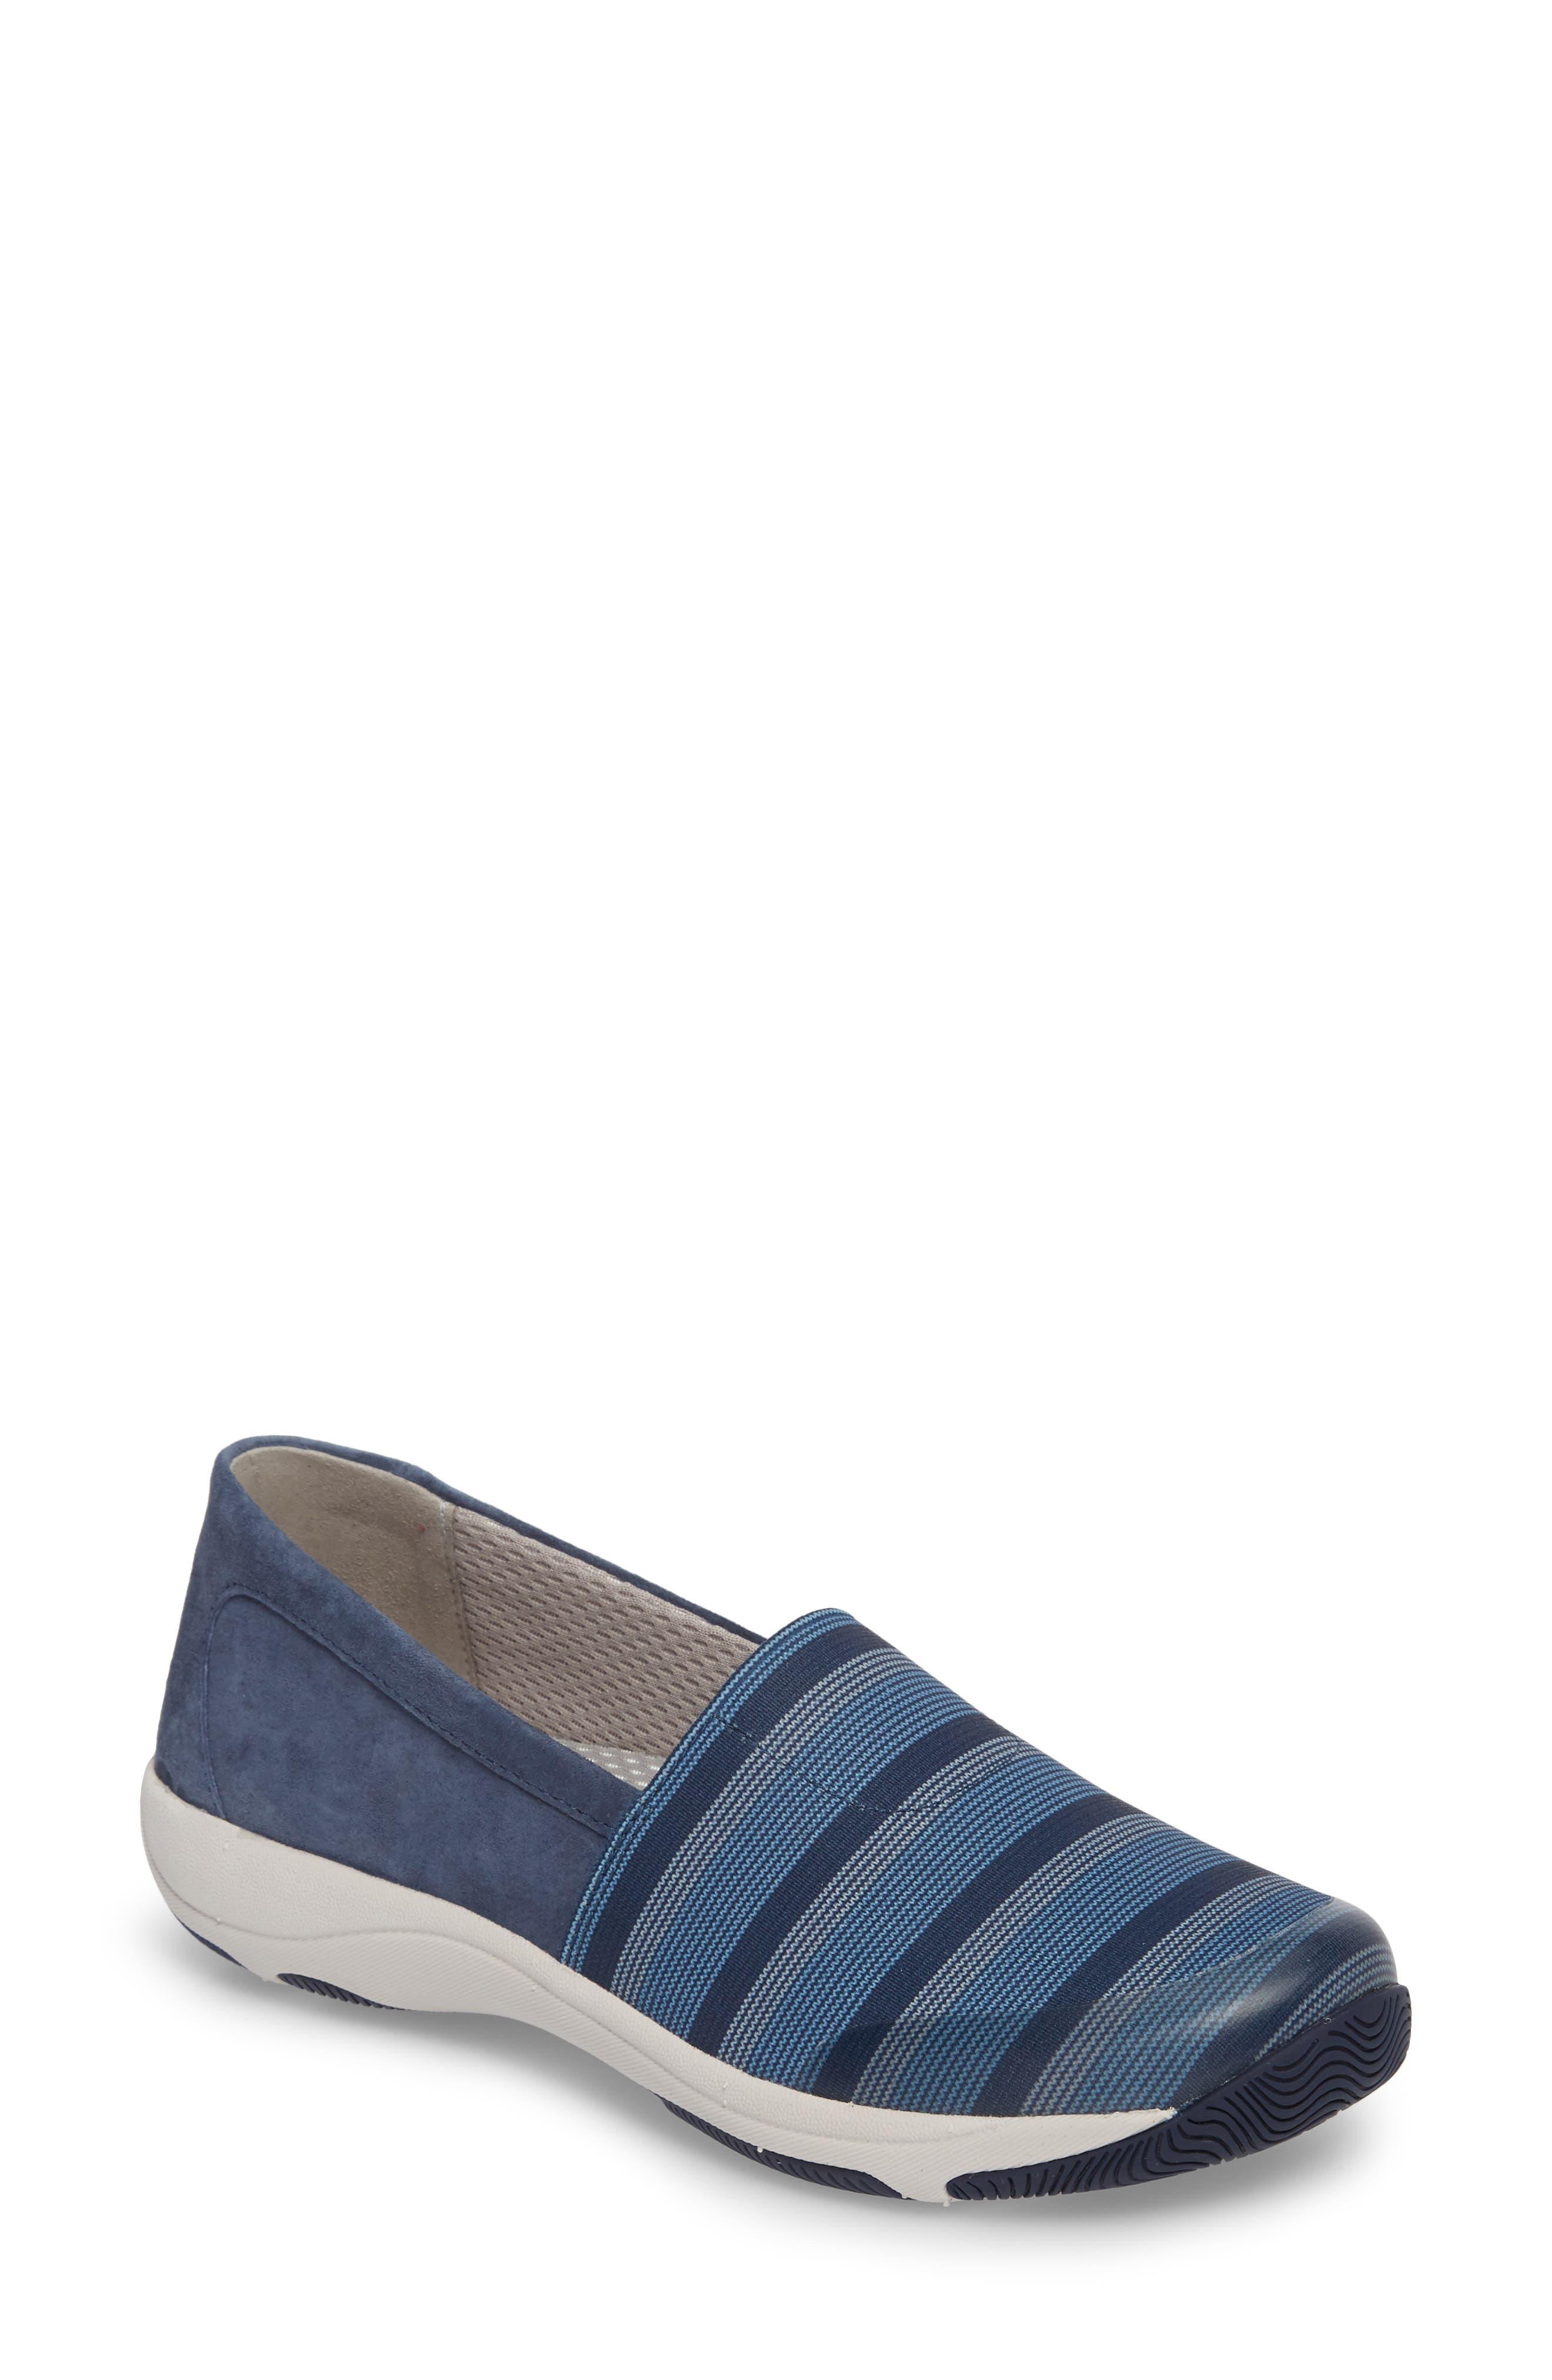 Harriet Slip-On Sneaker,                             Main thumbnail 1, color,                             Blue Suede